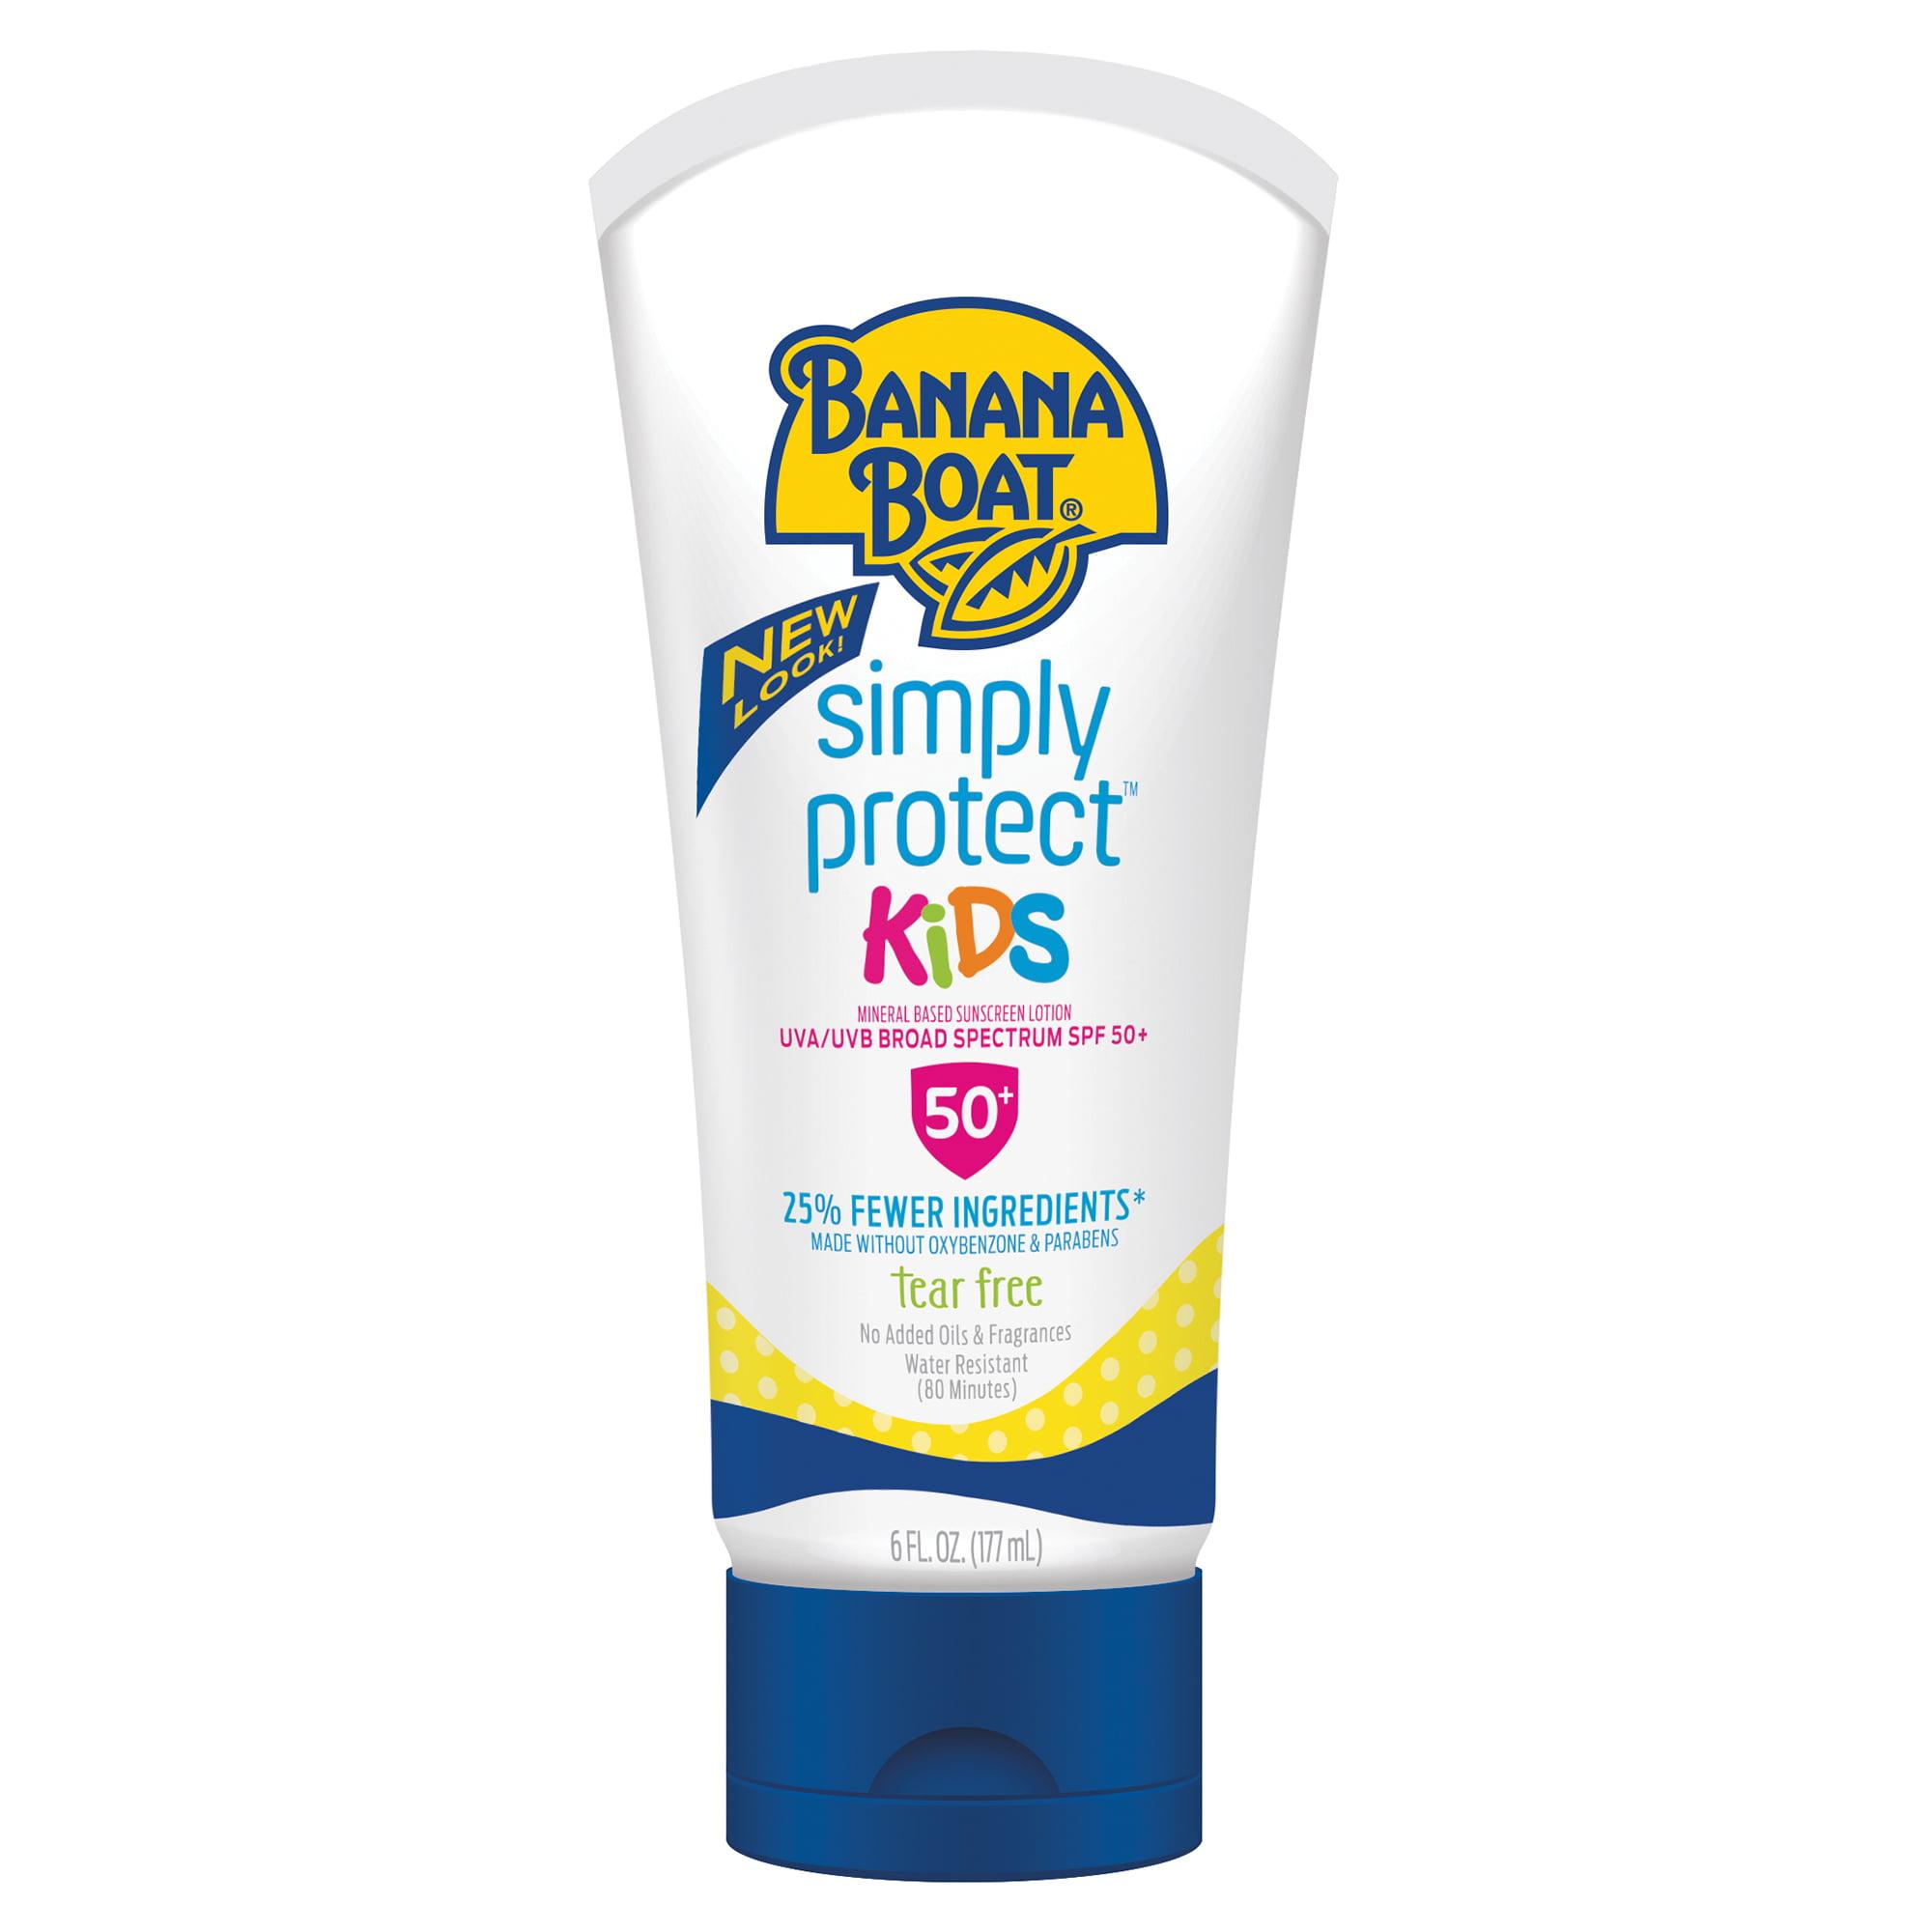 Banana Boat Simply Protect Kids Sunscreen Lotion SPF 50+, 6 Oz, Packaging May Vary